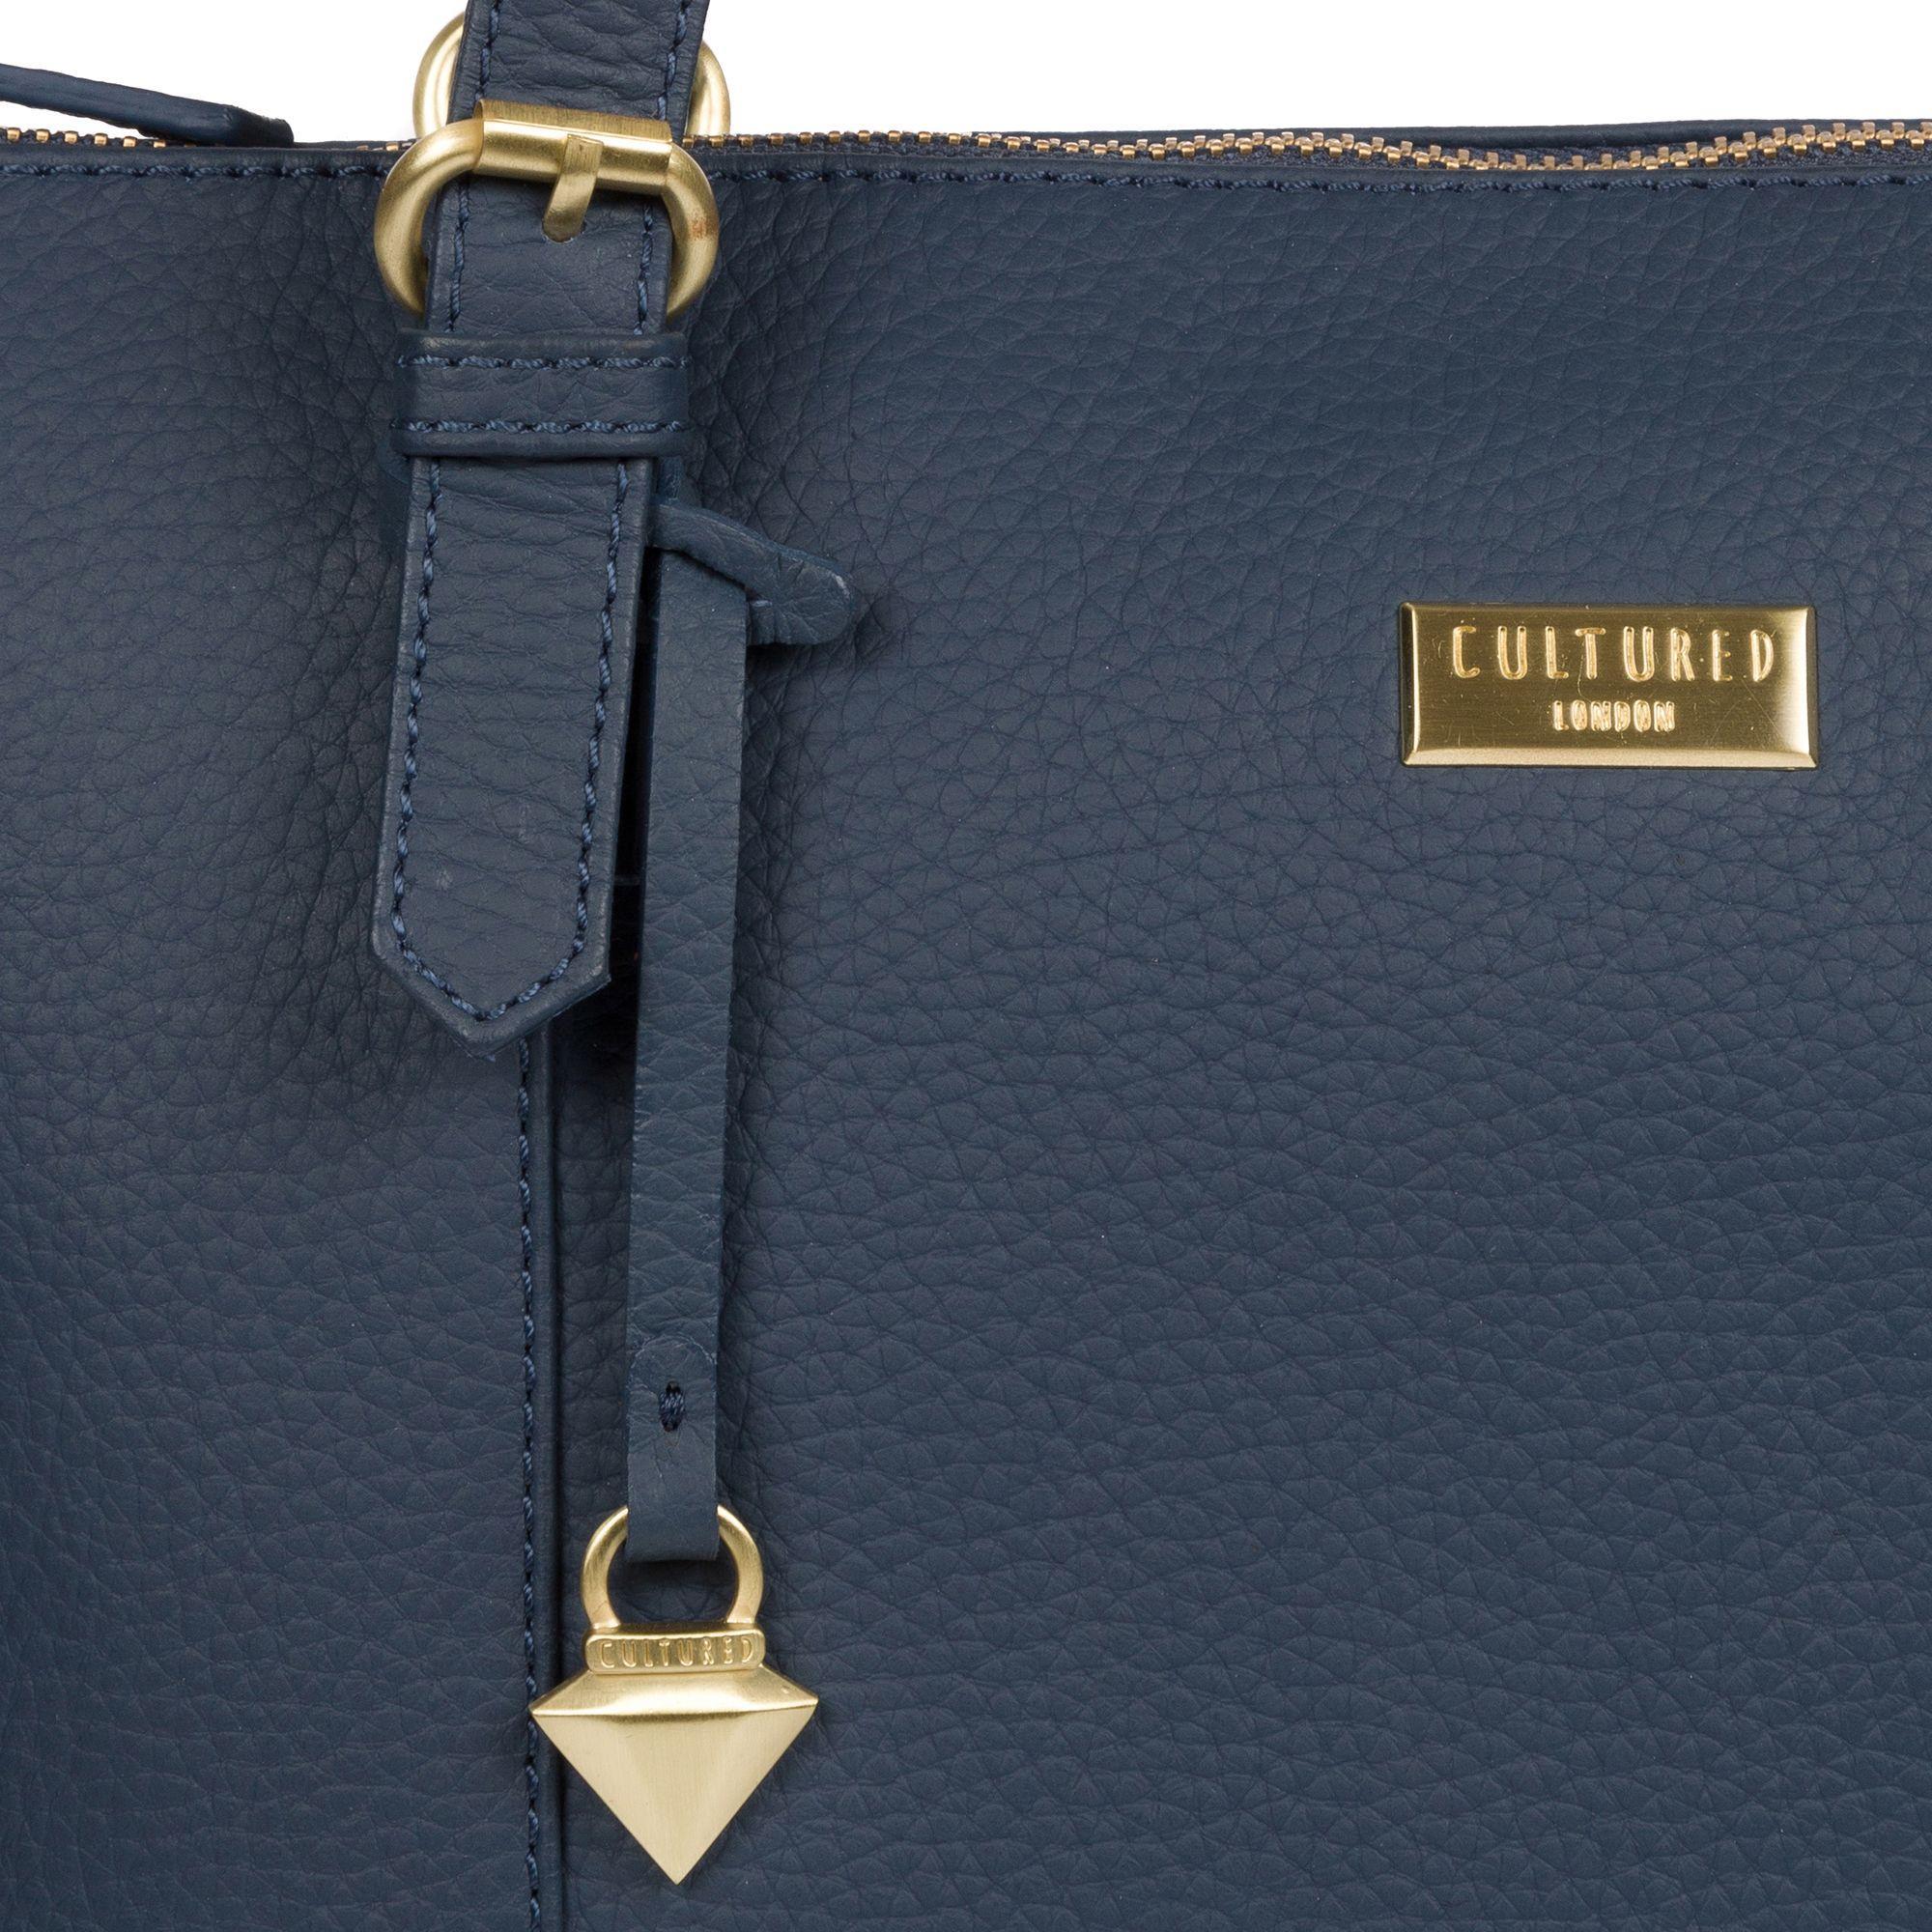 4ba92dfb2ed5 Cultured london denim pippa leather tote bag in blue lyst jpg 2000x2000  Pippa totes